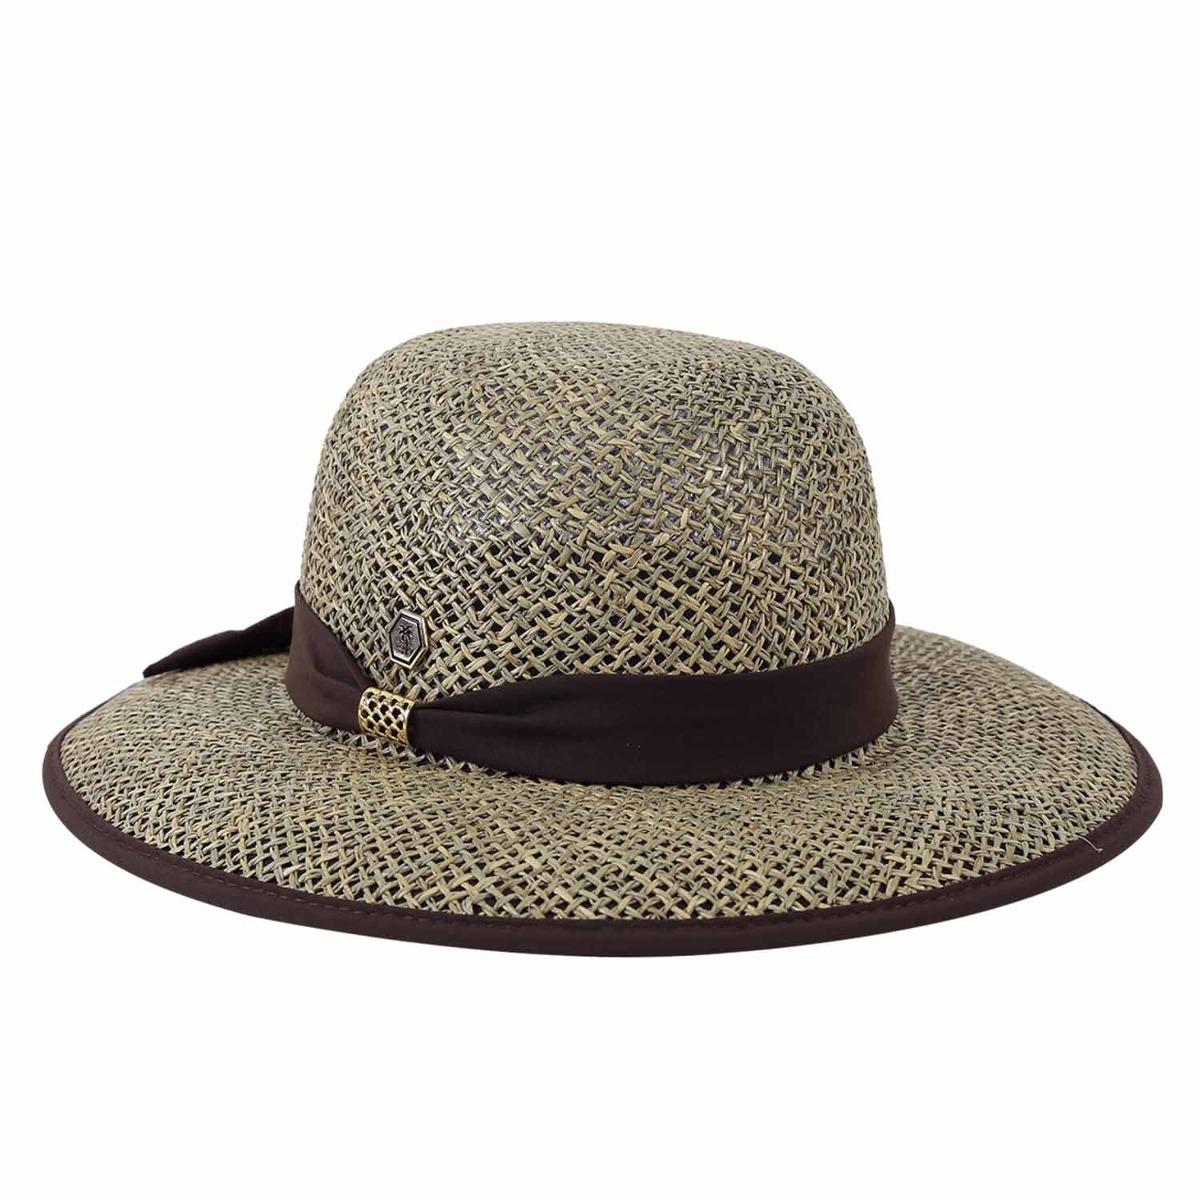 chapéu de praia feminino palha aba larga marrom. Carregando zoom. b789fe594e4